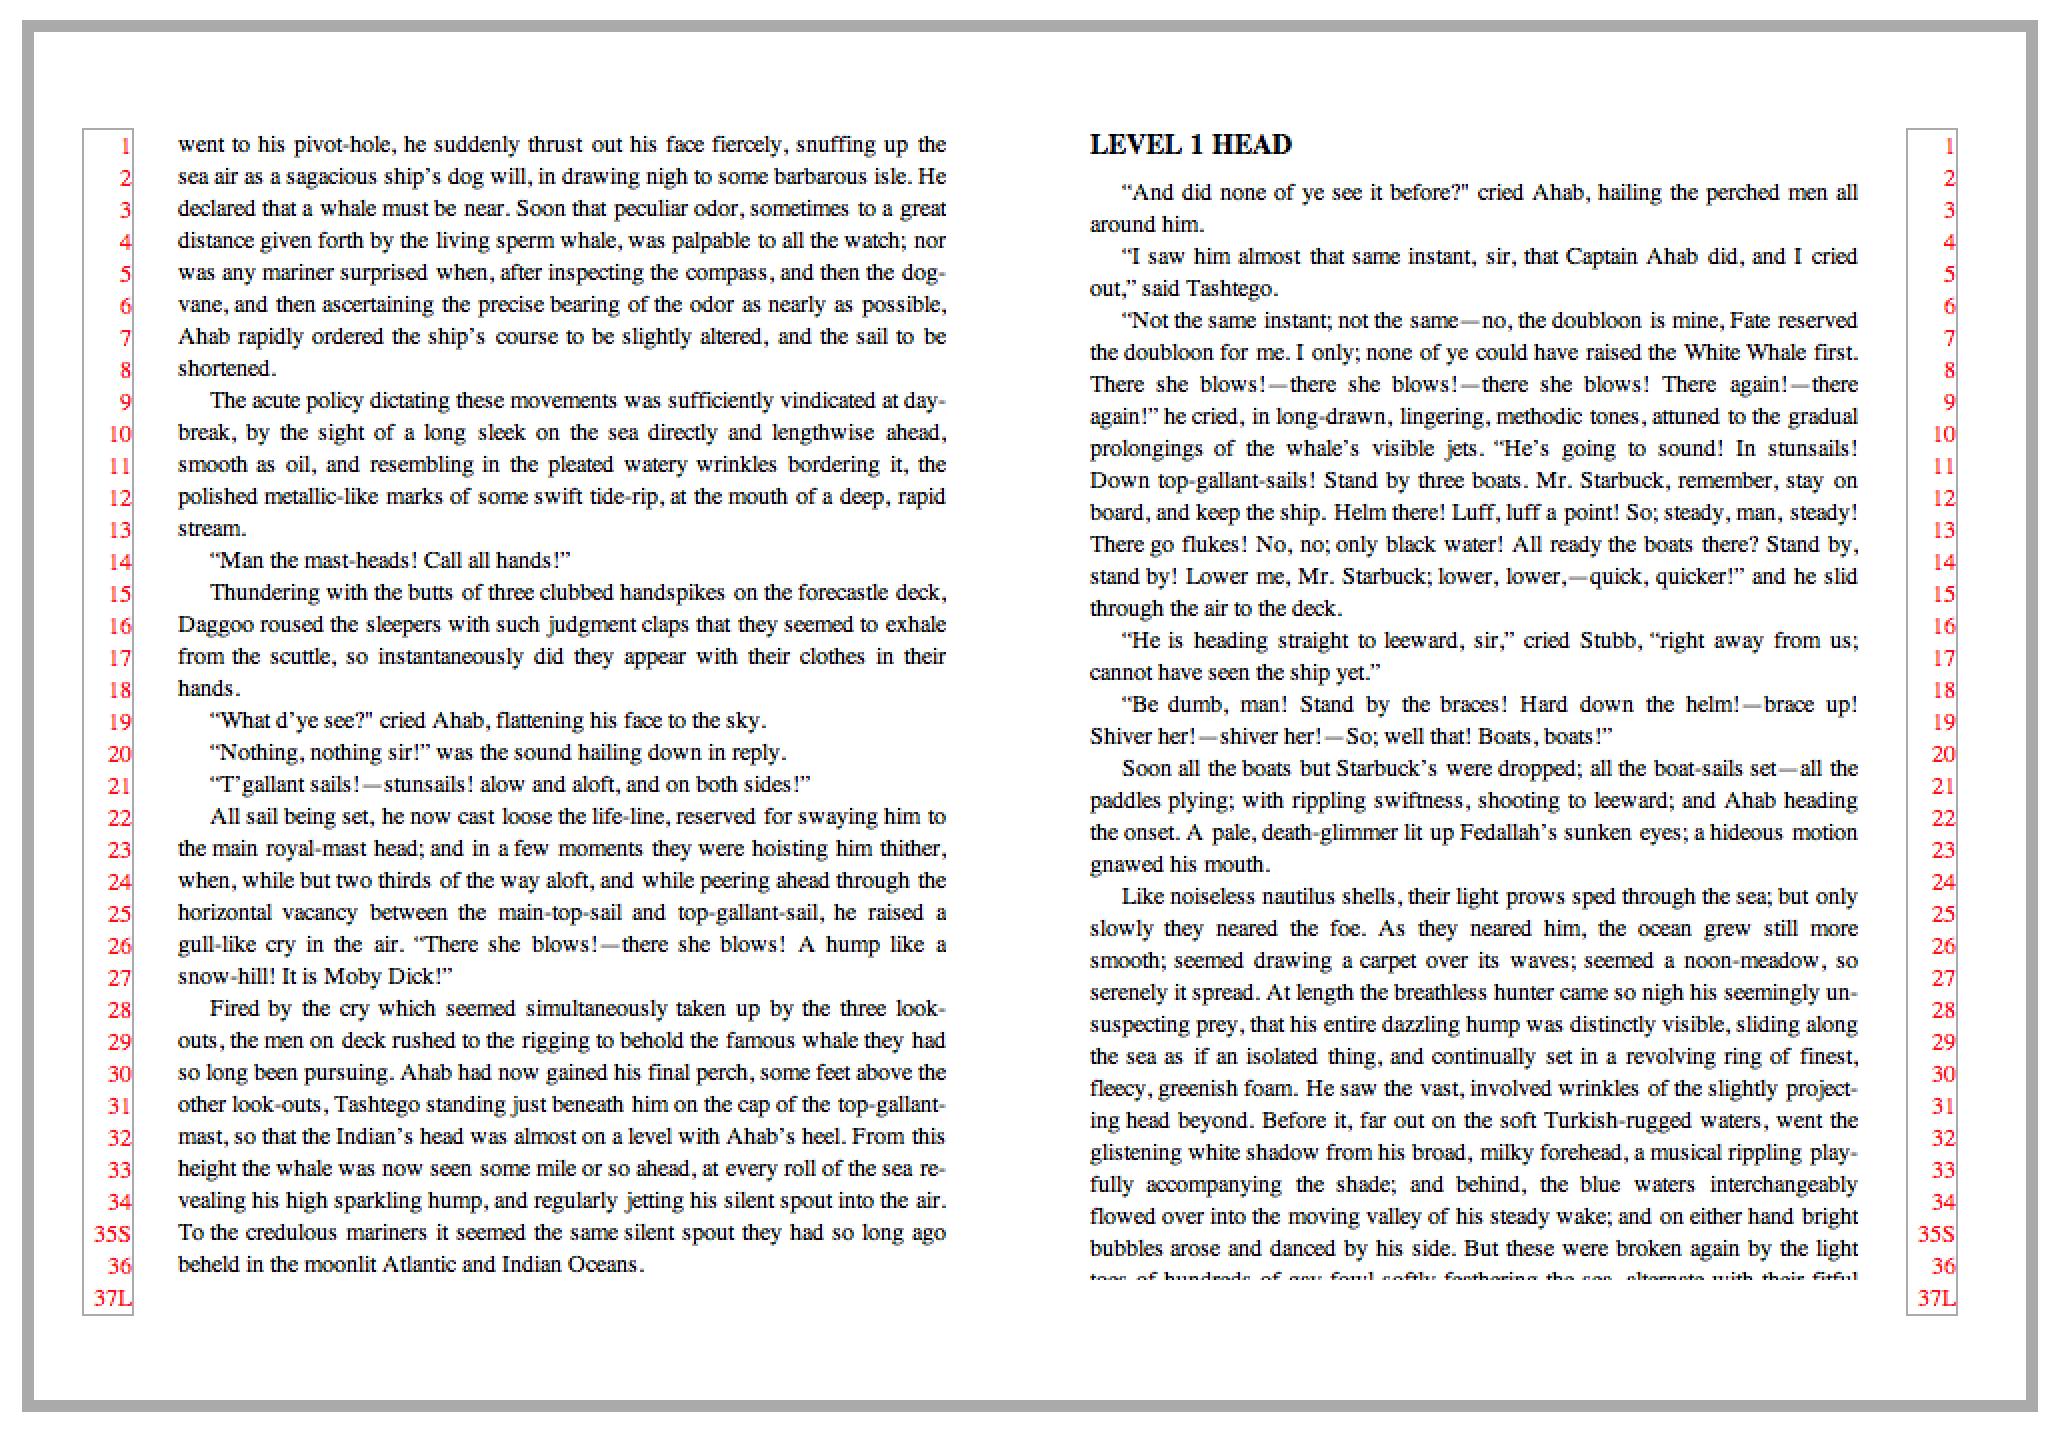 narrative style essay mla format